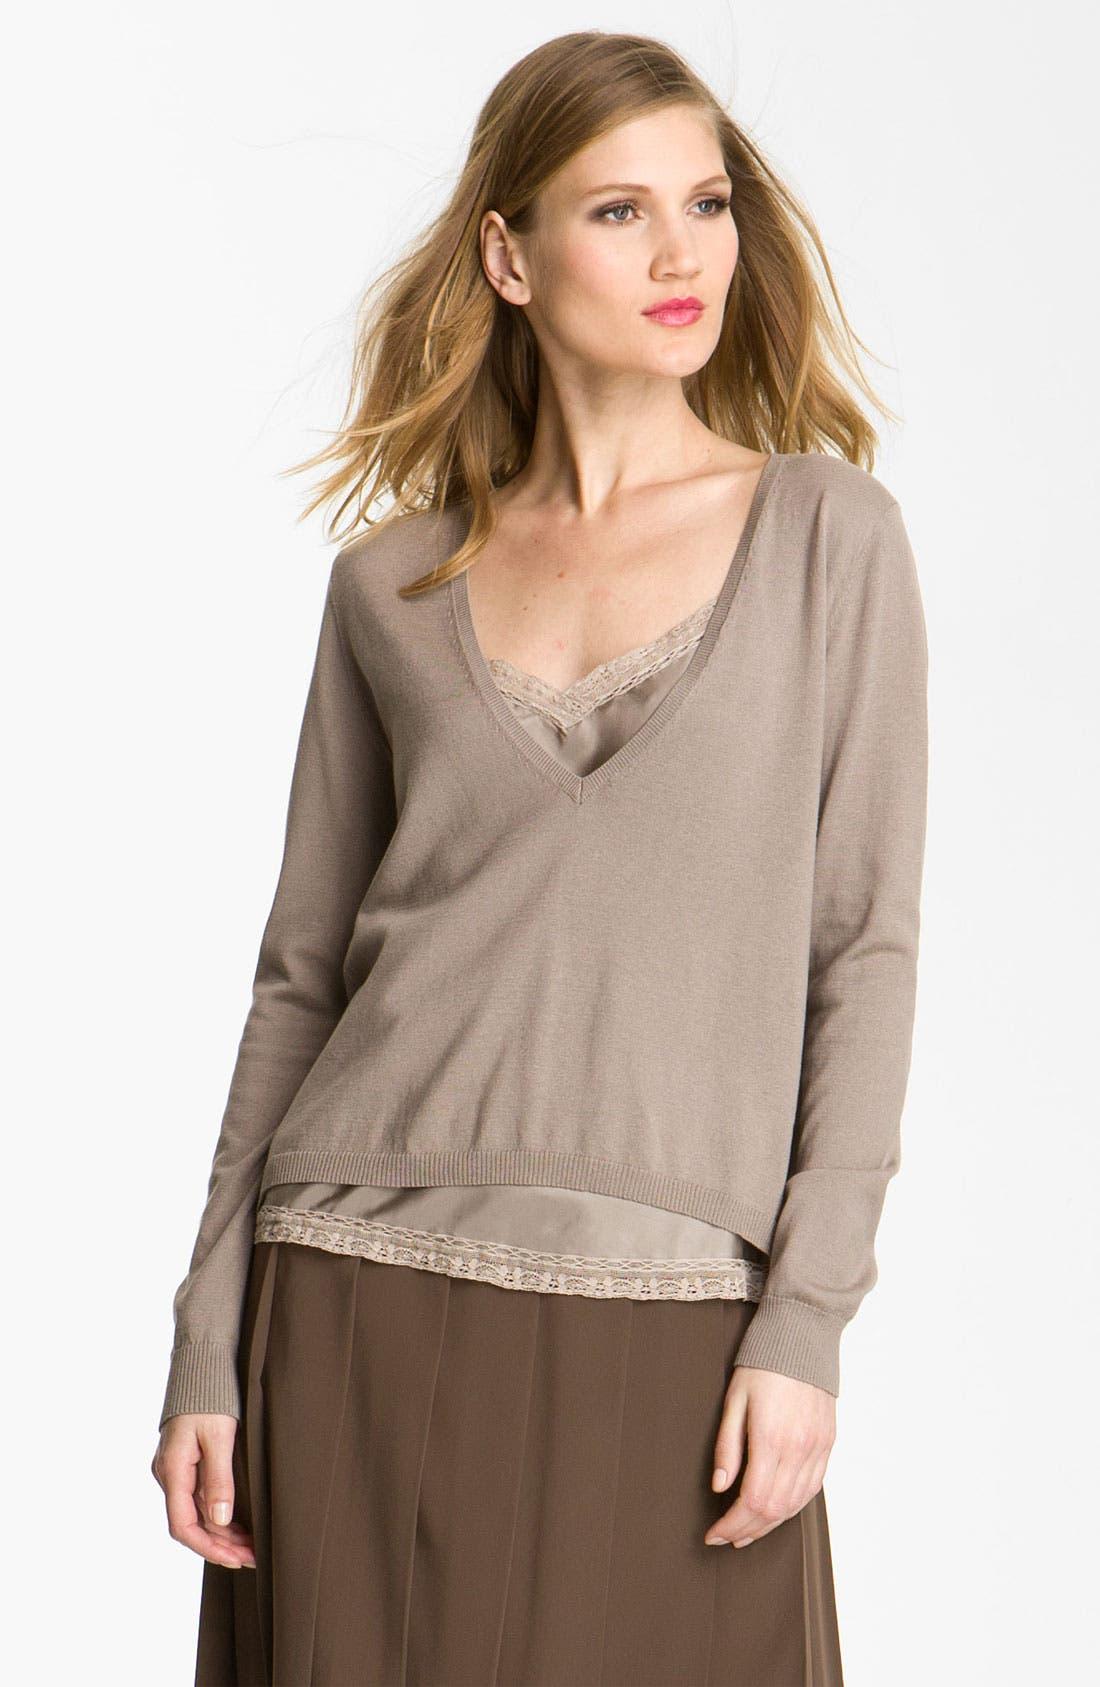 Main Image - Weekend Max Mara 'Opale' Sweater & Camisole